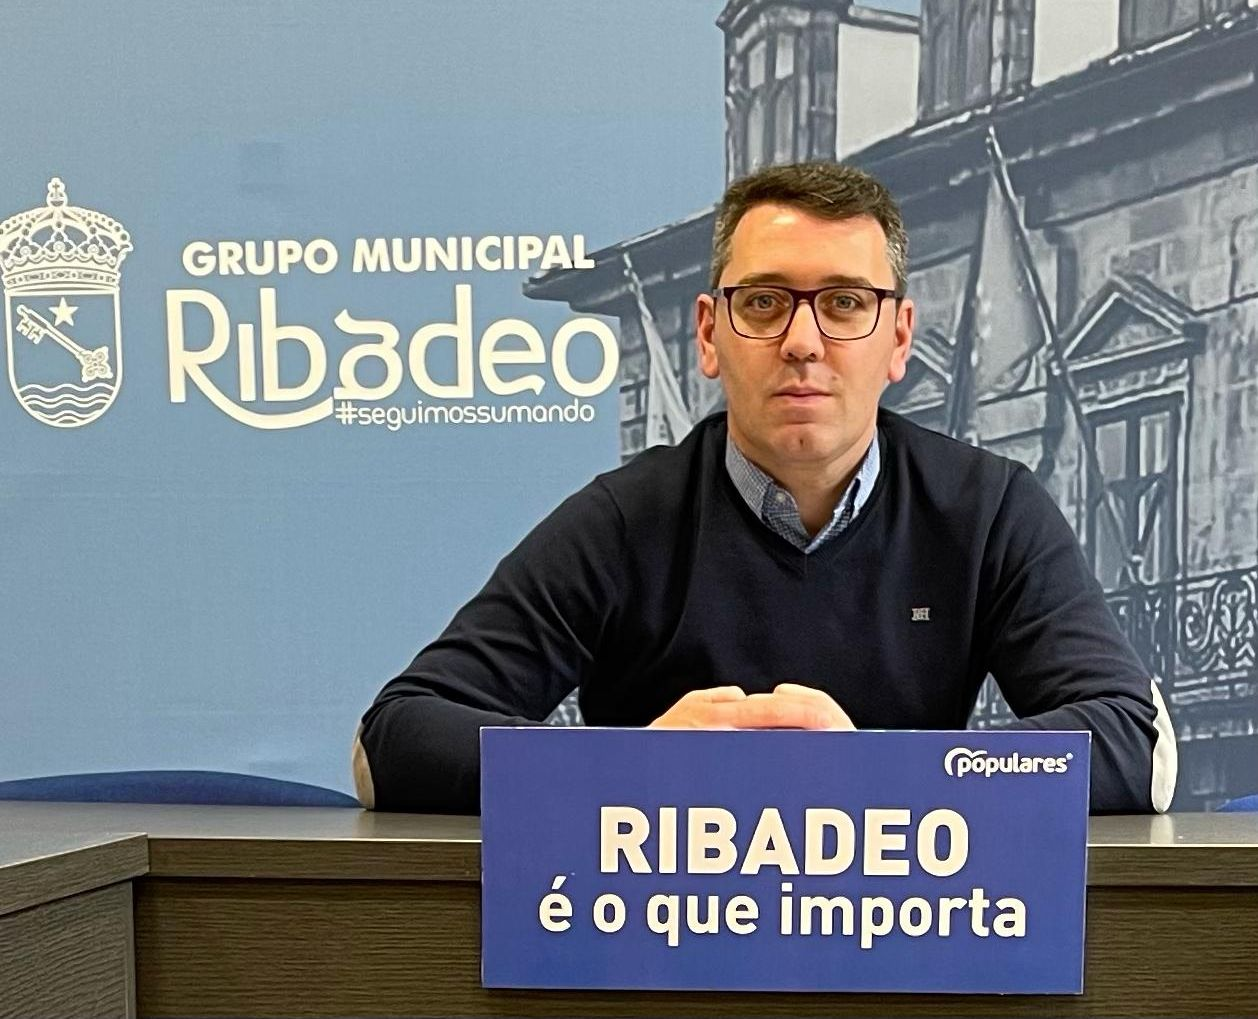 O PP de Ribadeo denuncia falta de transparencia do goberno local